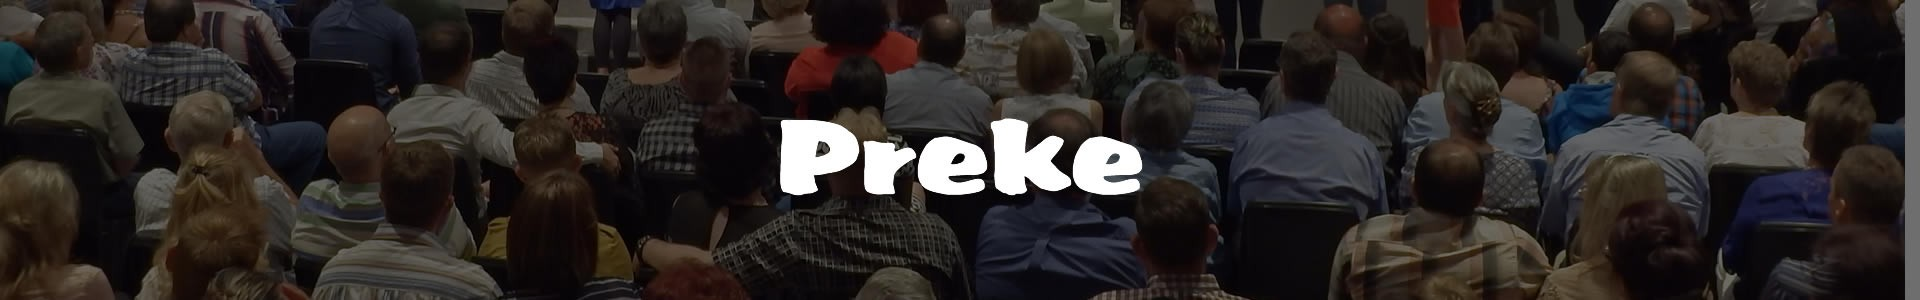 Preke banner